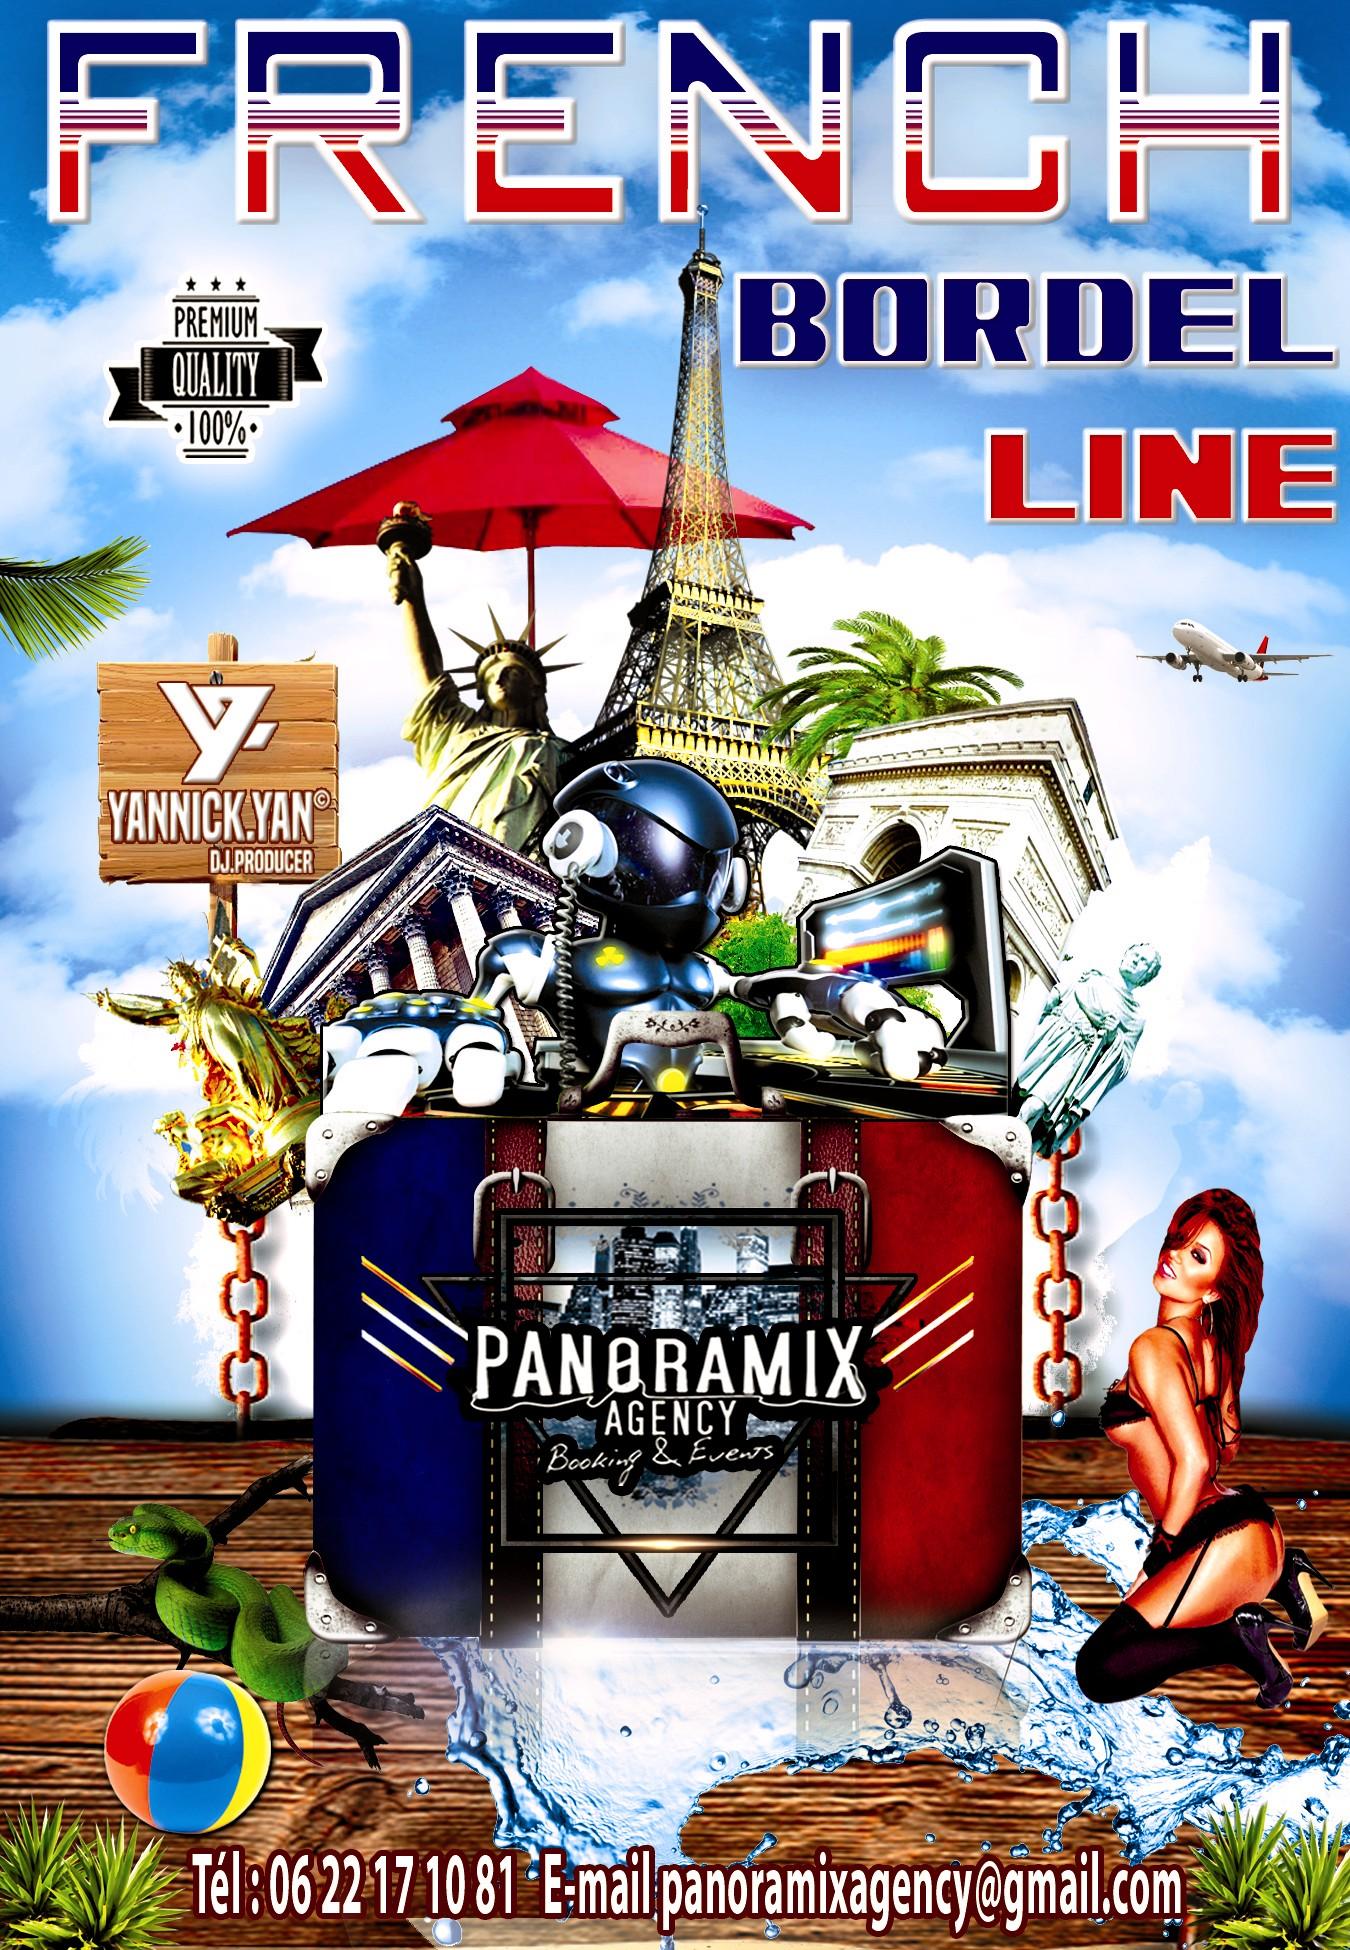 https://panoramix-radio-station.com/wp-content/uploads/2017/04/FRENCH-BORDEL-fini-bleu.jpg